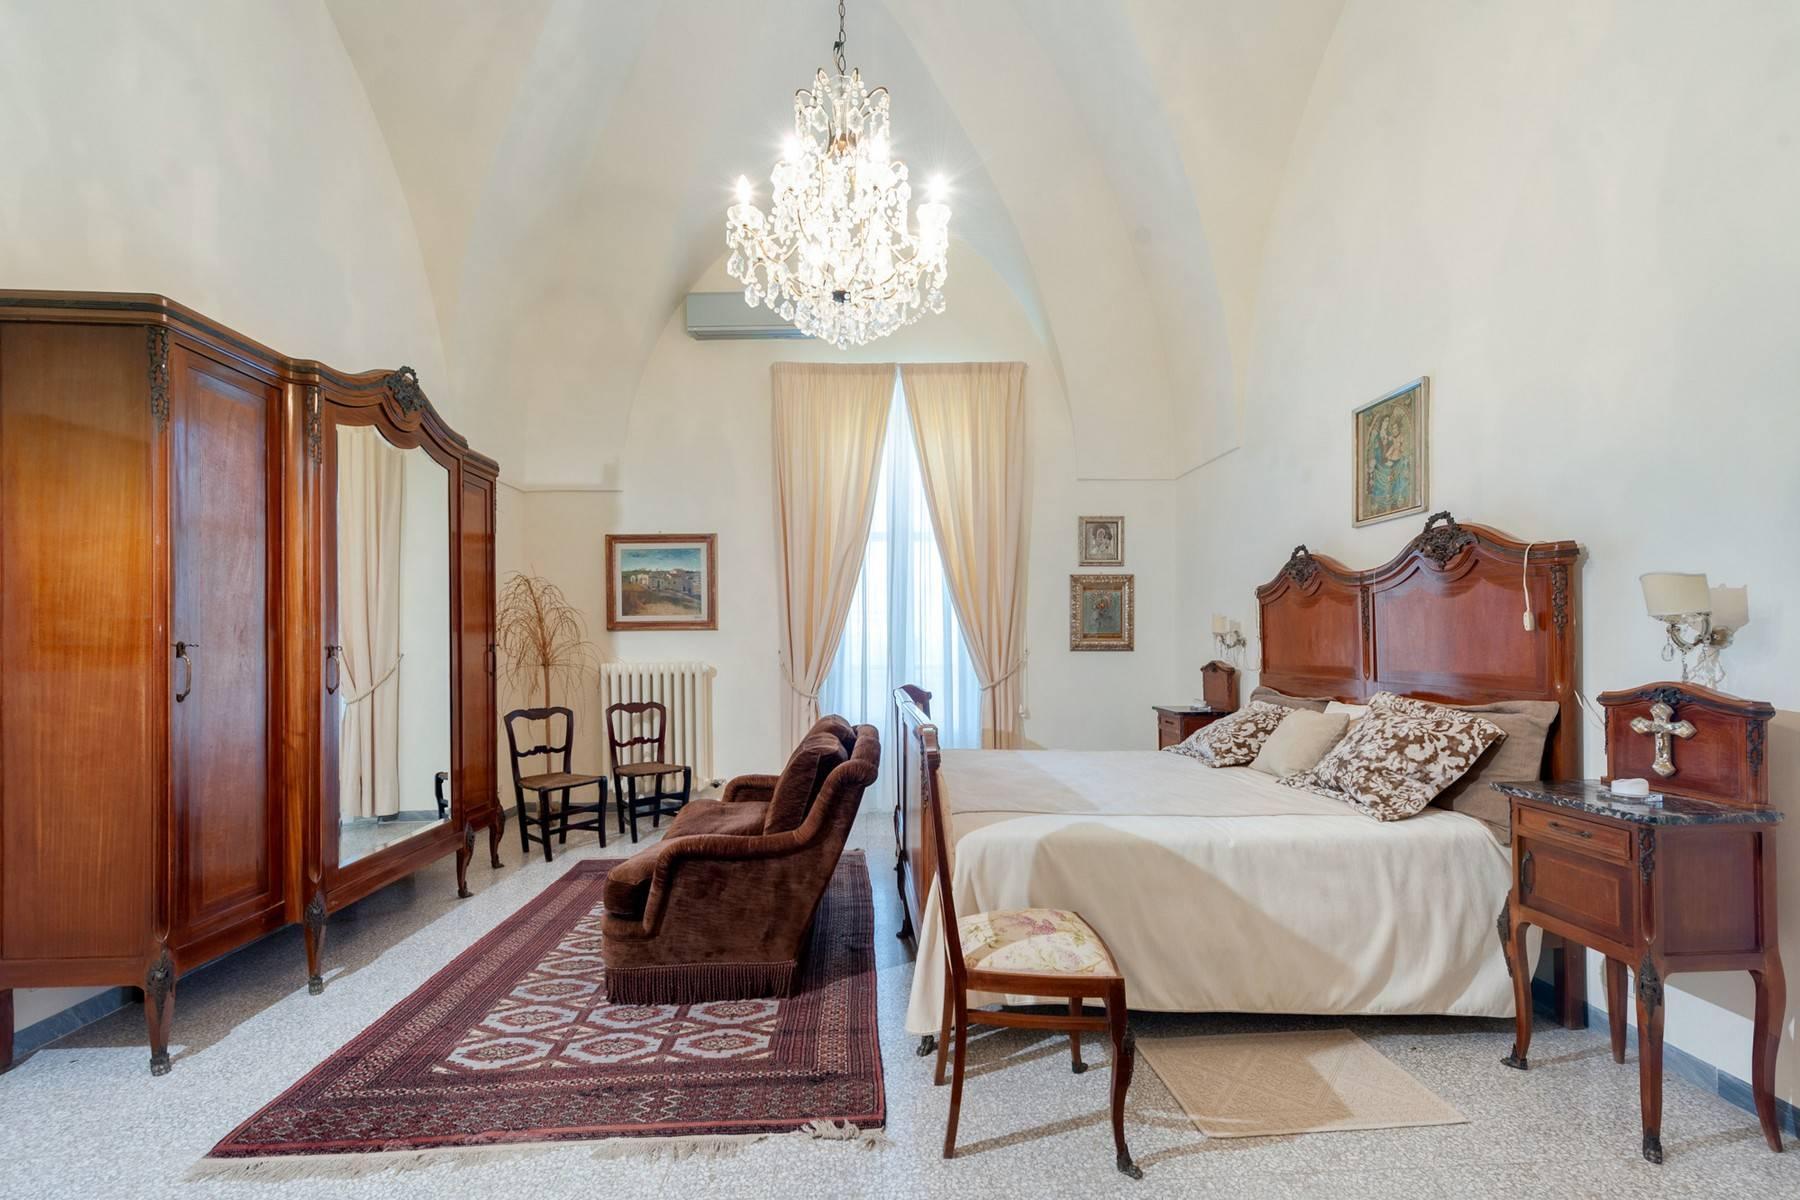 Splendida villa gentilizia del '600 circondata da agrumeti - 24